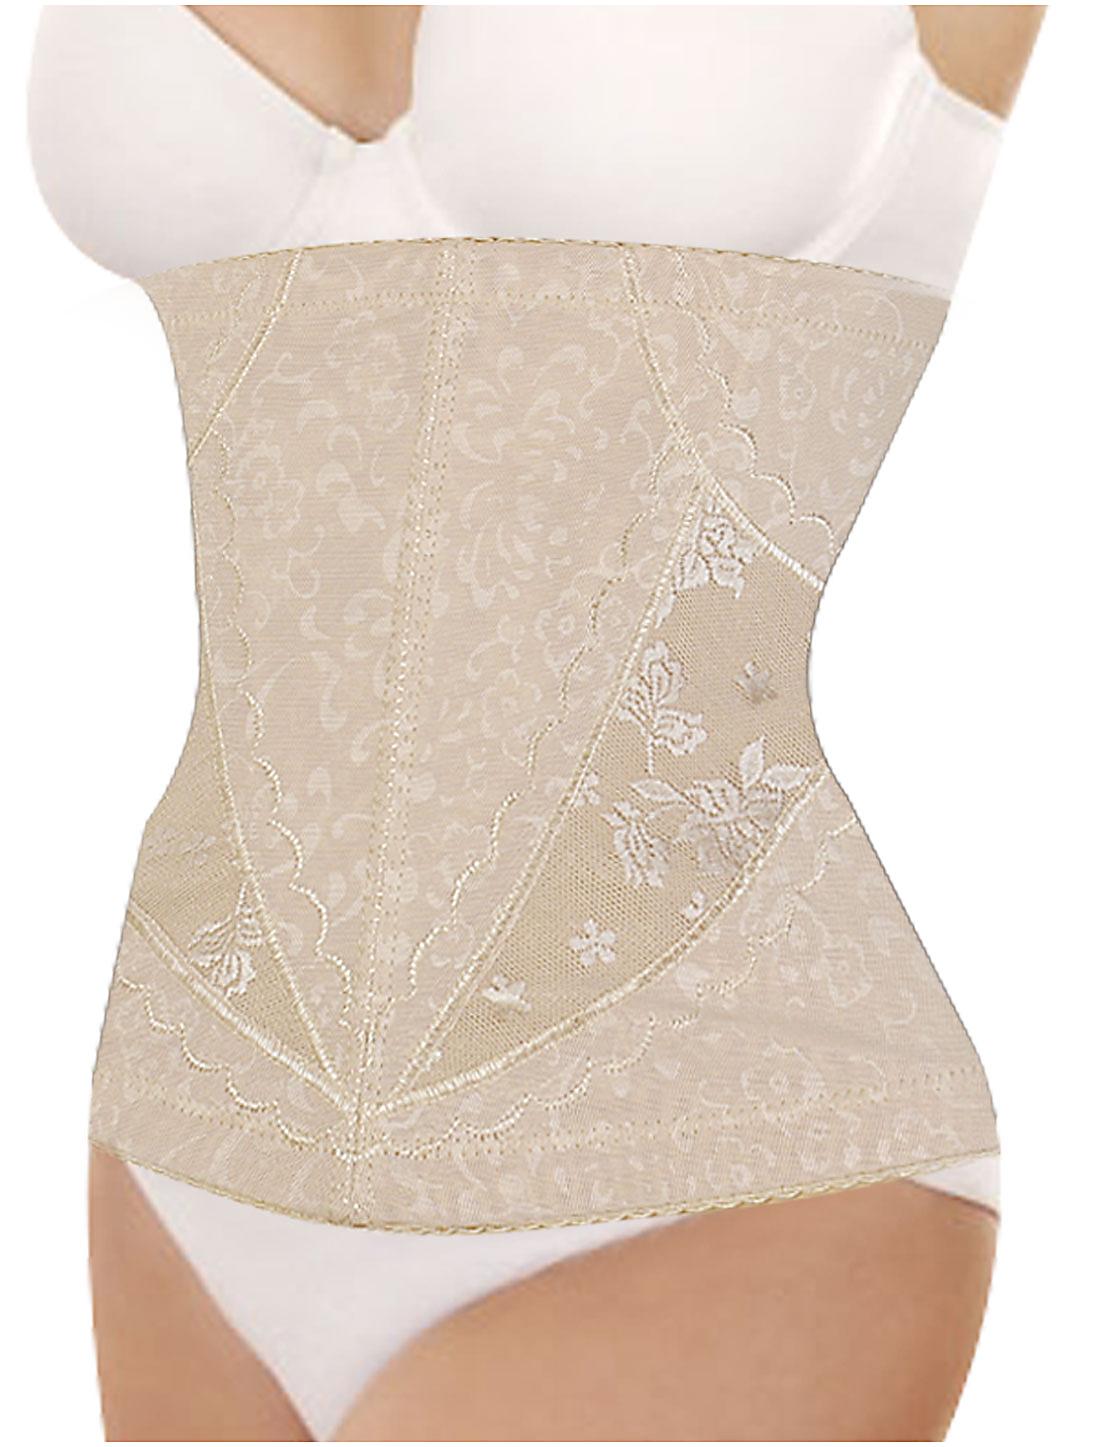 Women Floral Pattern Elastic Shapewear Slimming Belt Corset Waist Cincher Flesh Color M